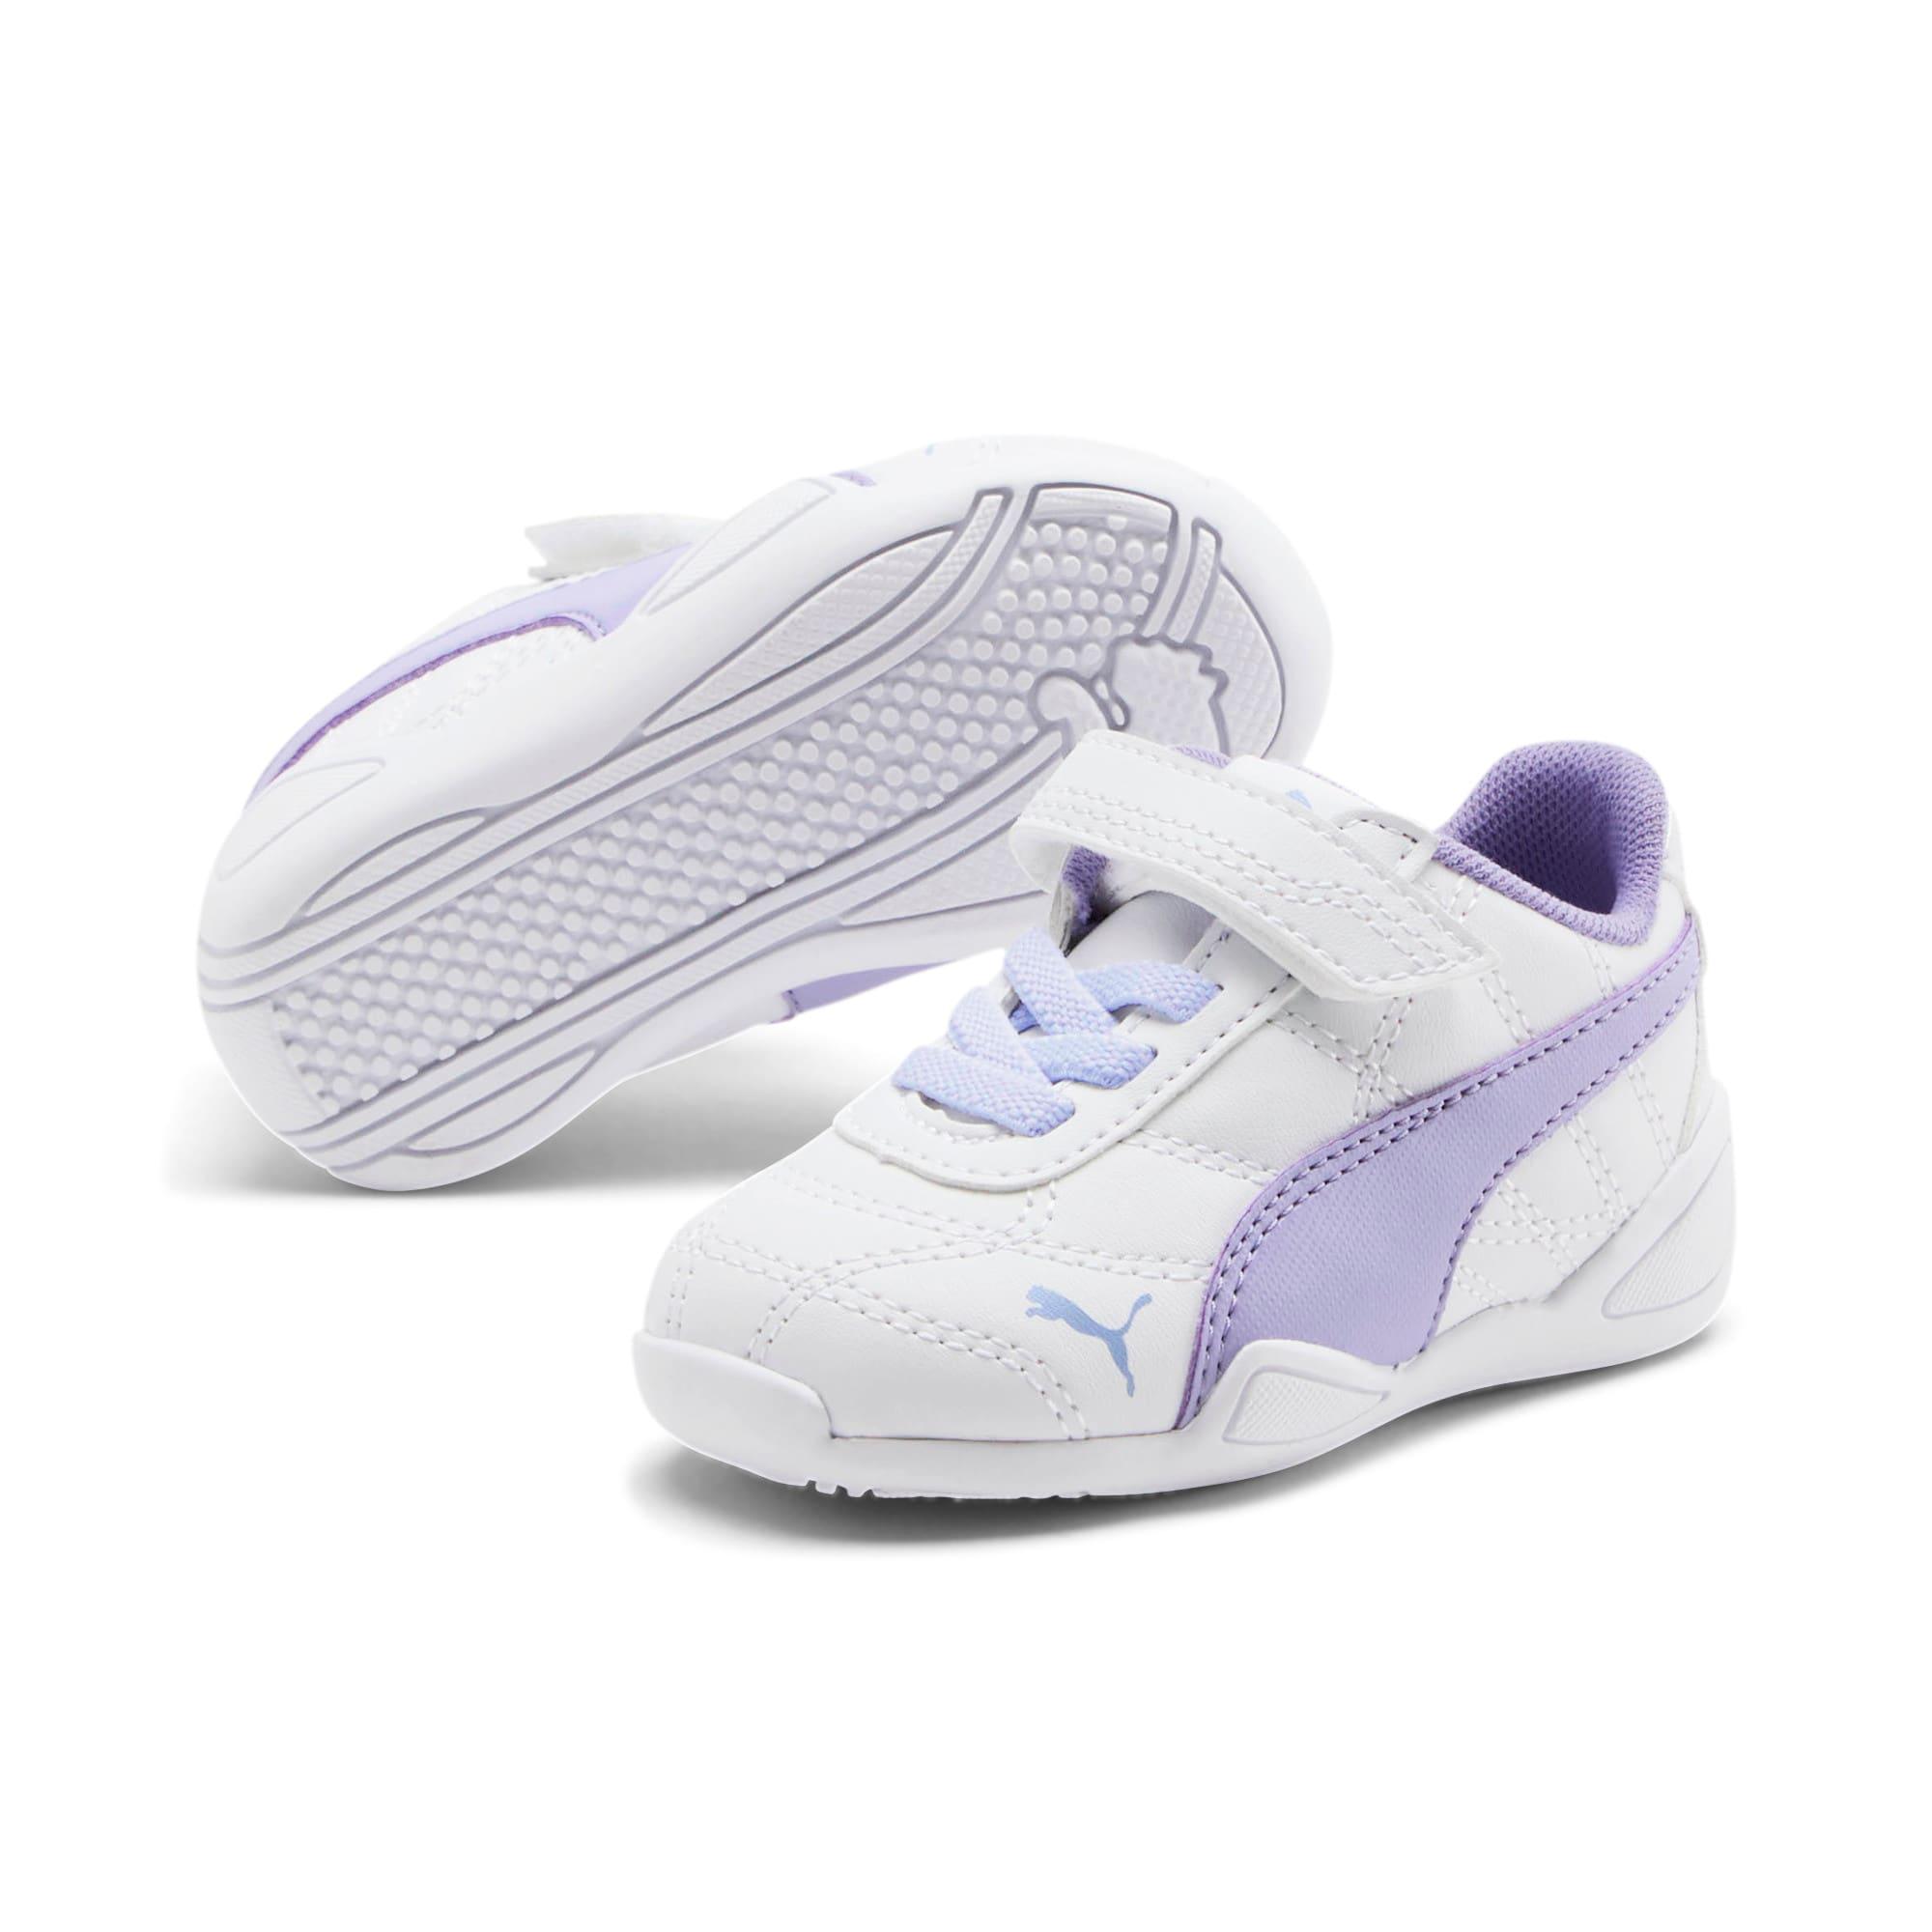 Thumbnail 2 of Tune Cat 3 AC Toddler Shoes, Puma White-Sweet Lavender, medium